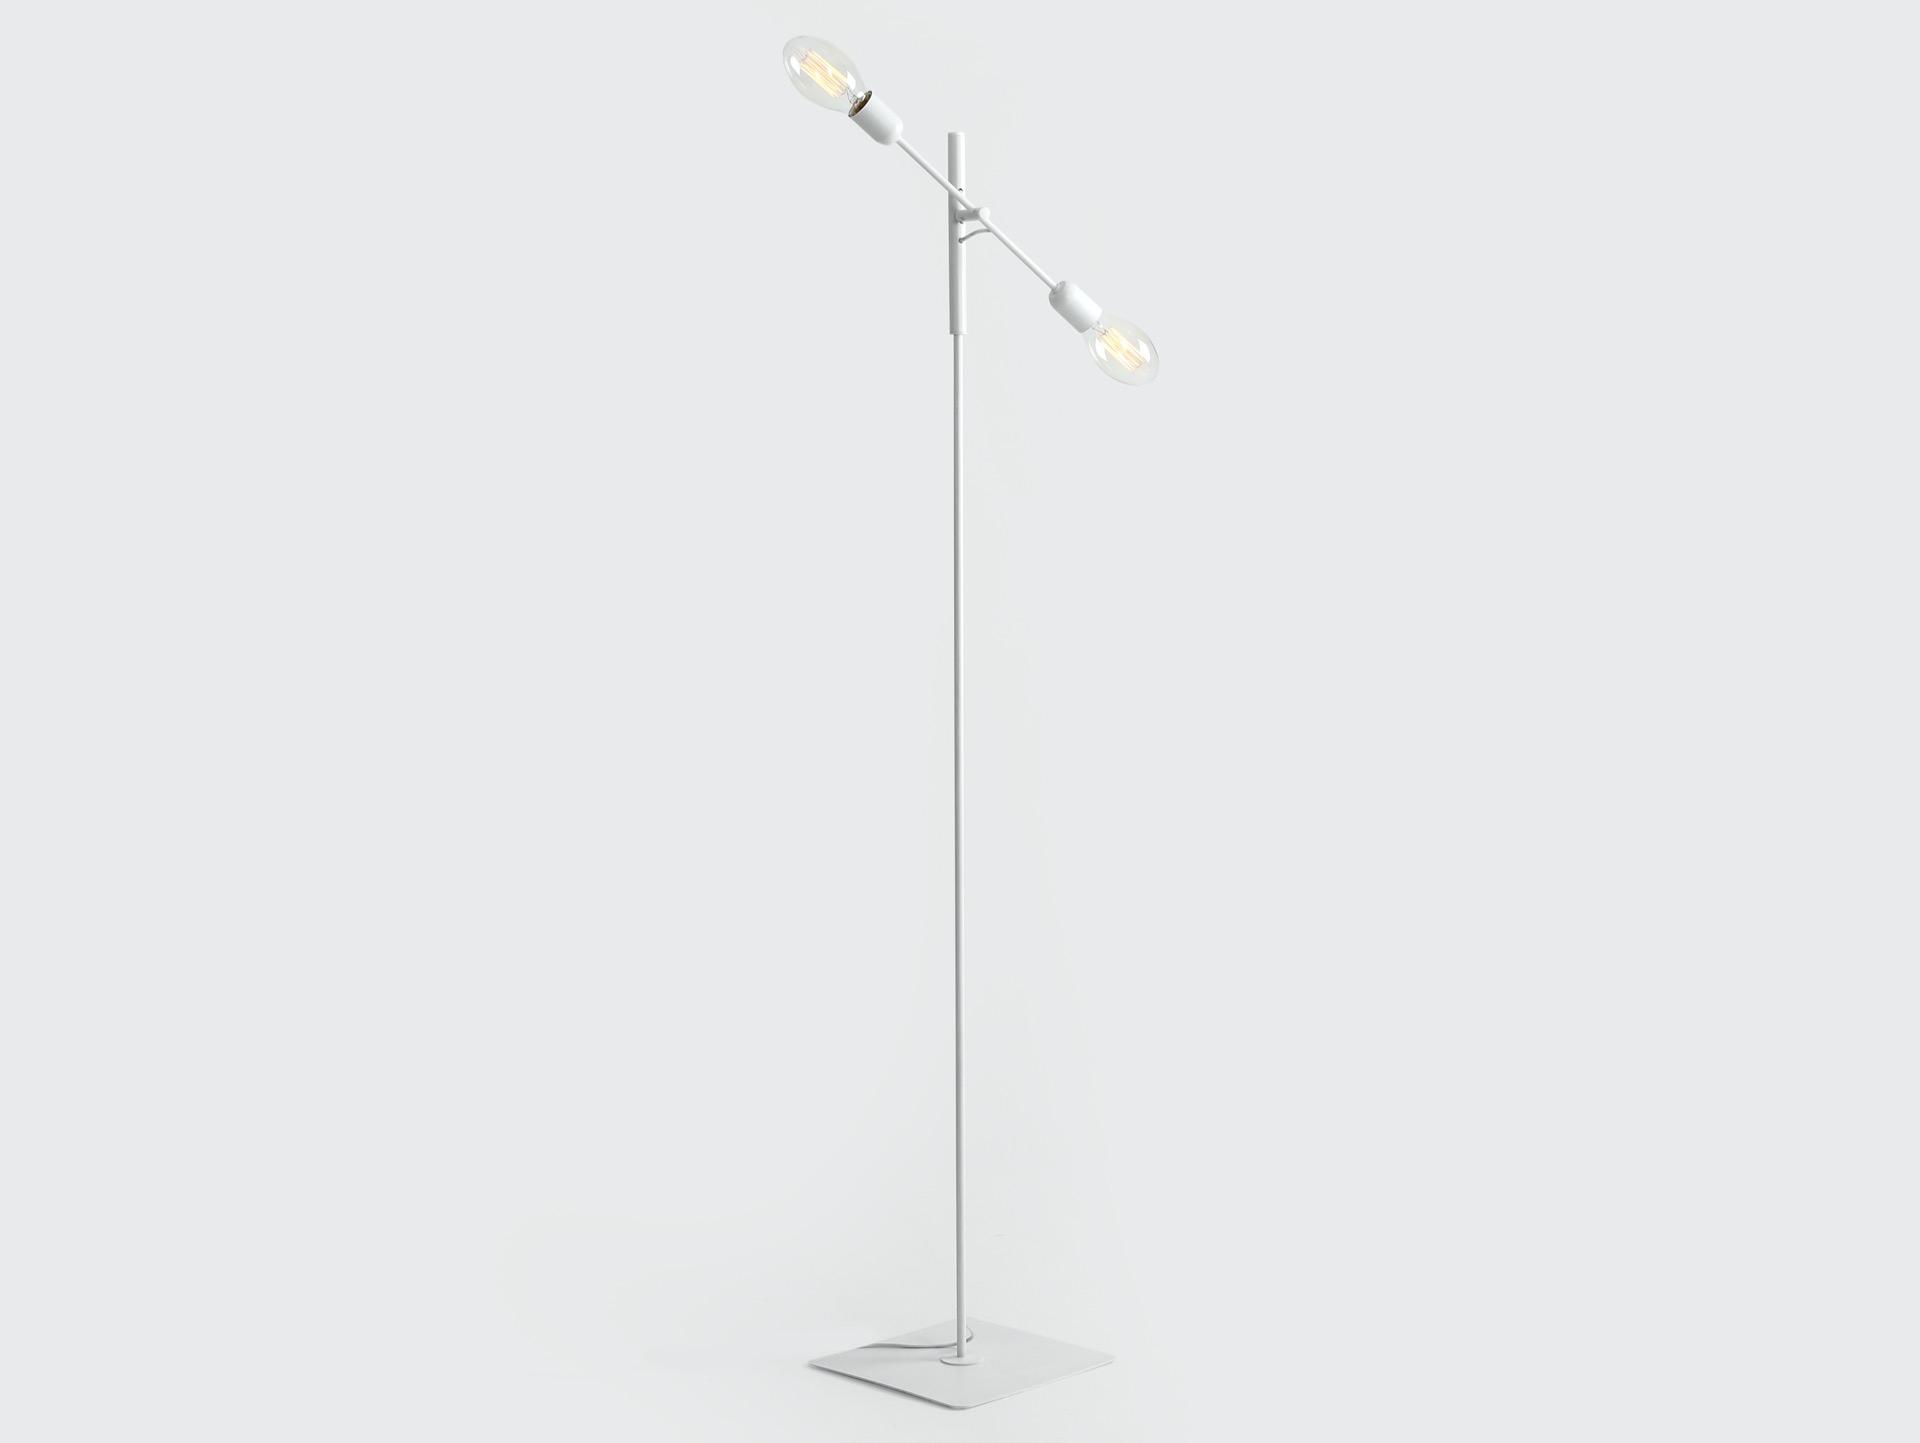 Stehlampe TWIGO 2